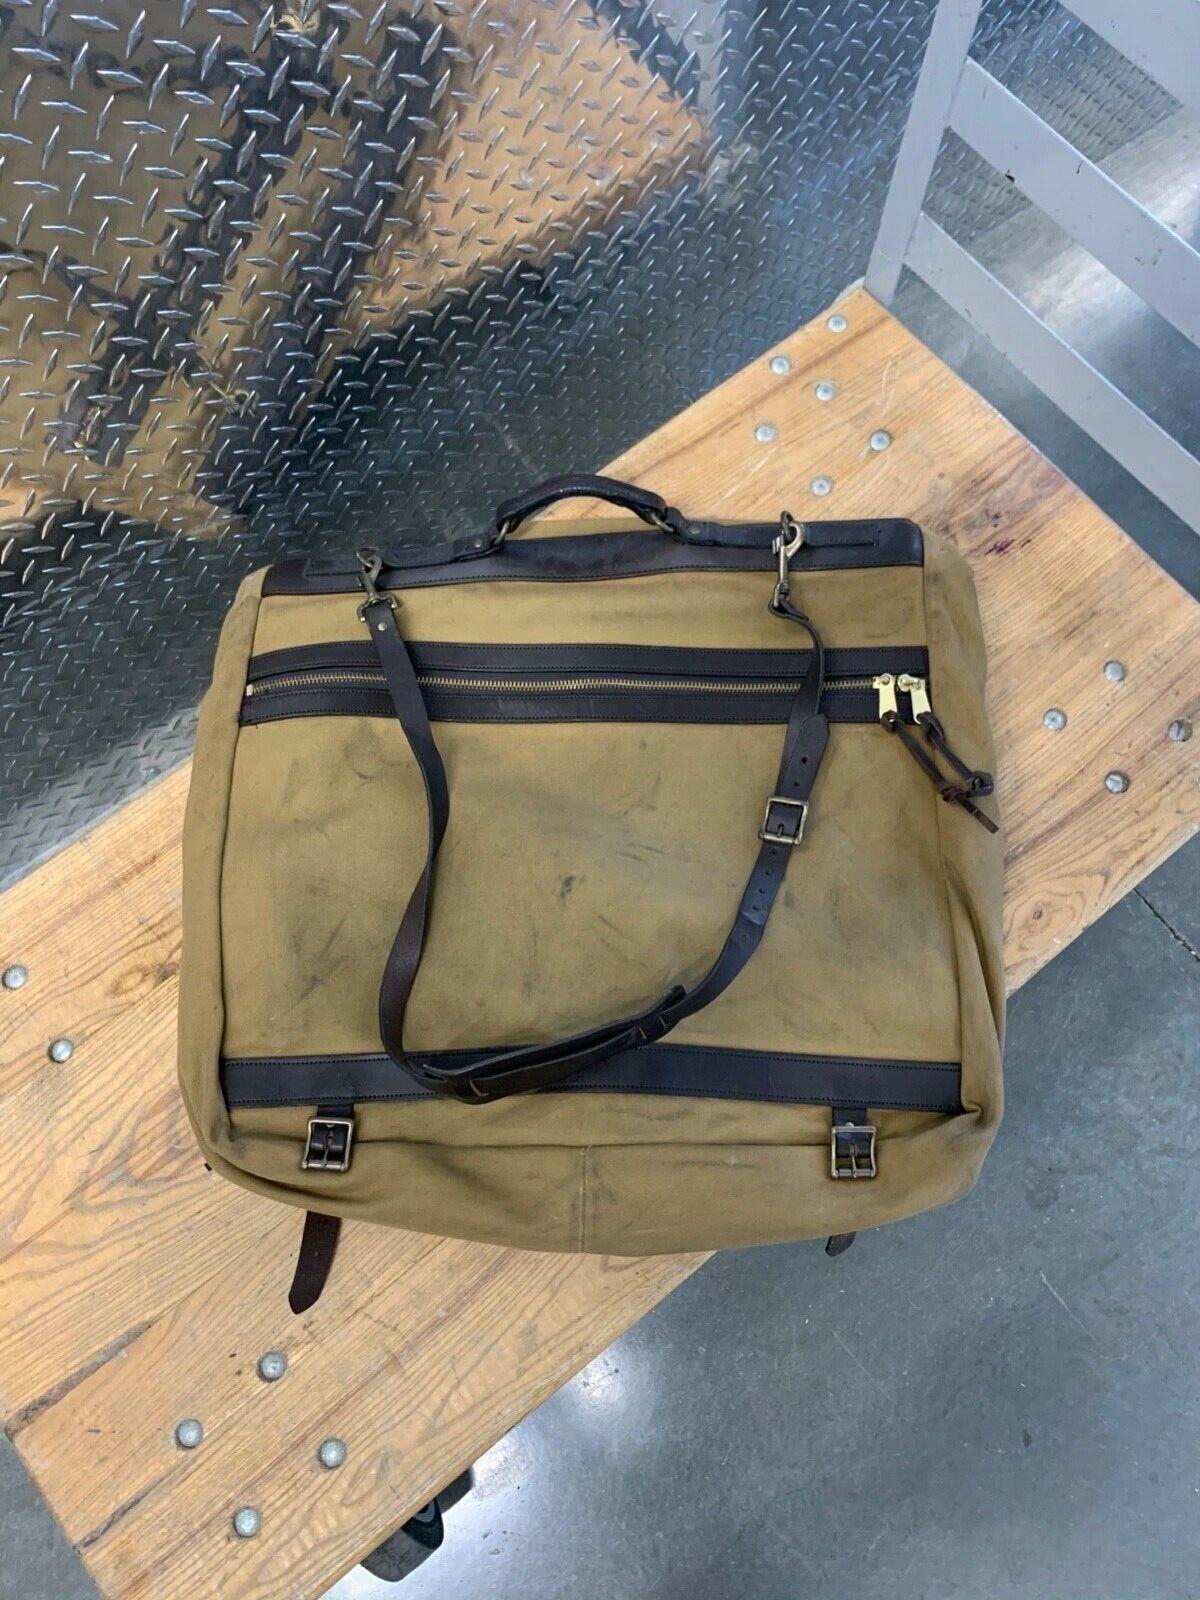 Filson 70270 44 x24 x5 Garment Bags - Tan - $200.00